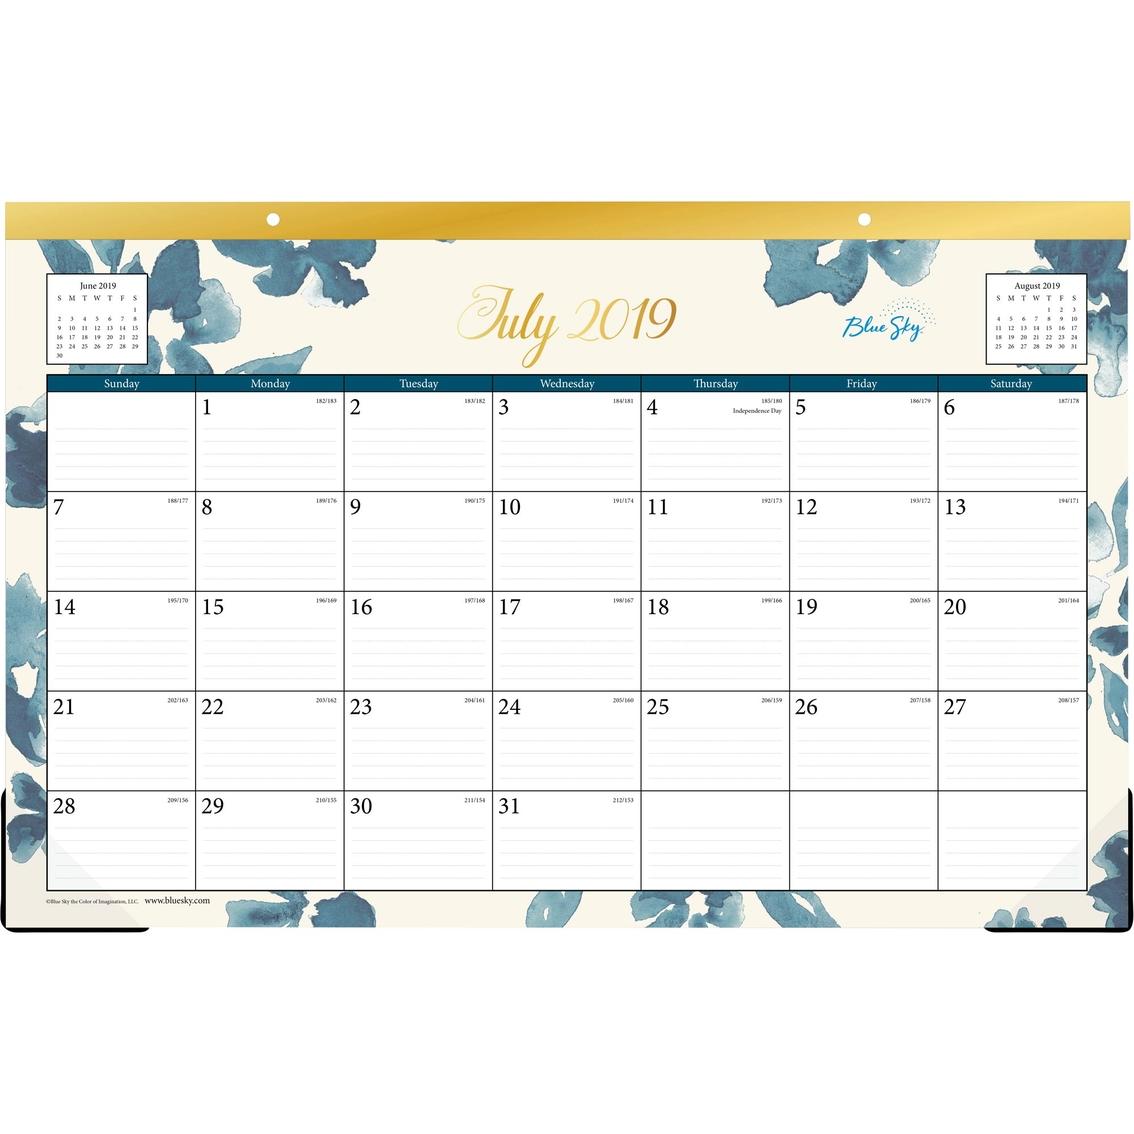 July Calendar 2020.Blue Sky July 2019 July 2020 Desk Pad Calendar Bakah Blue